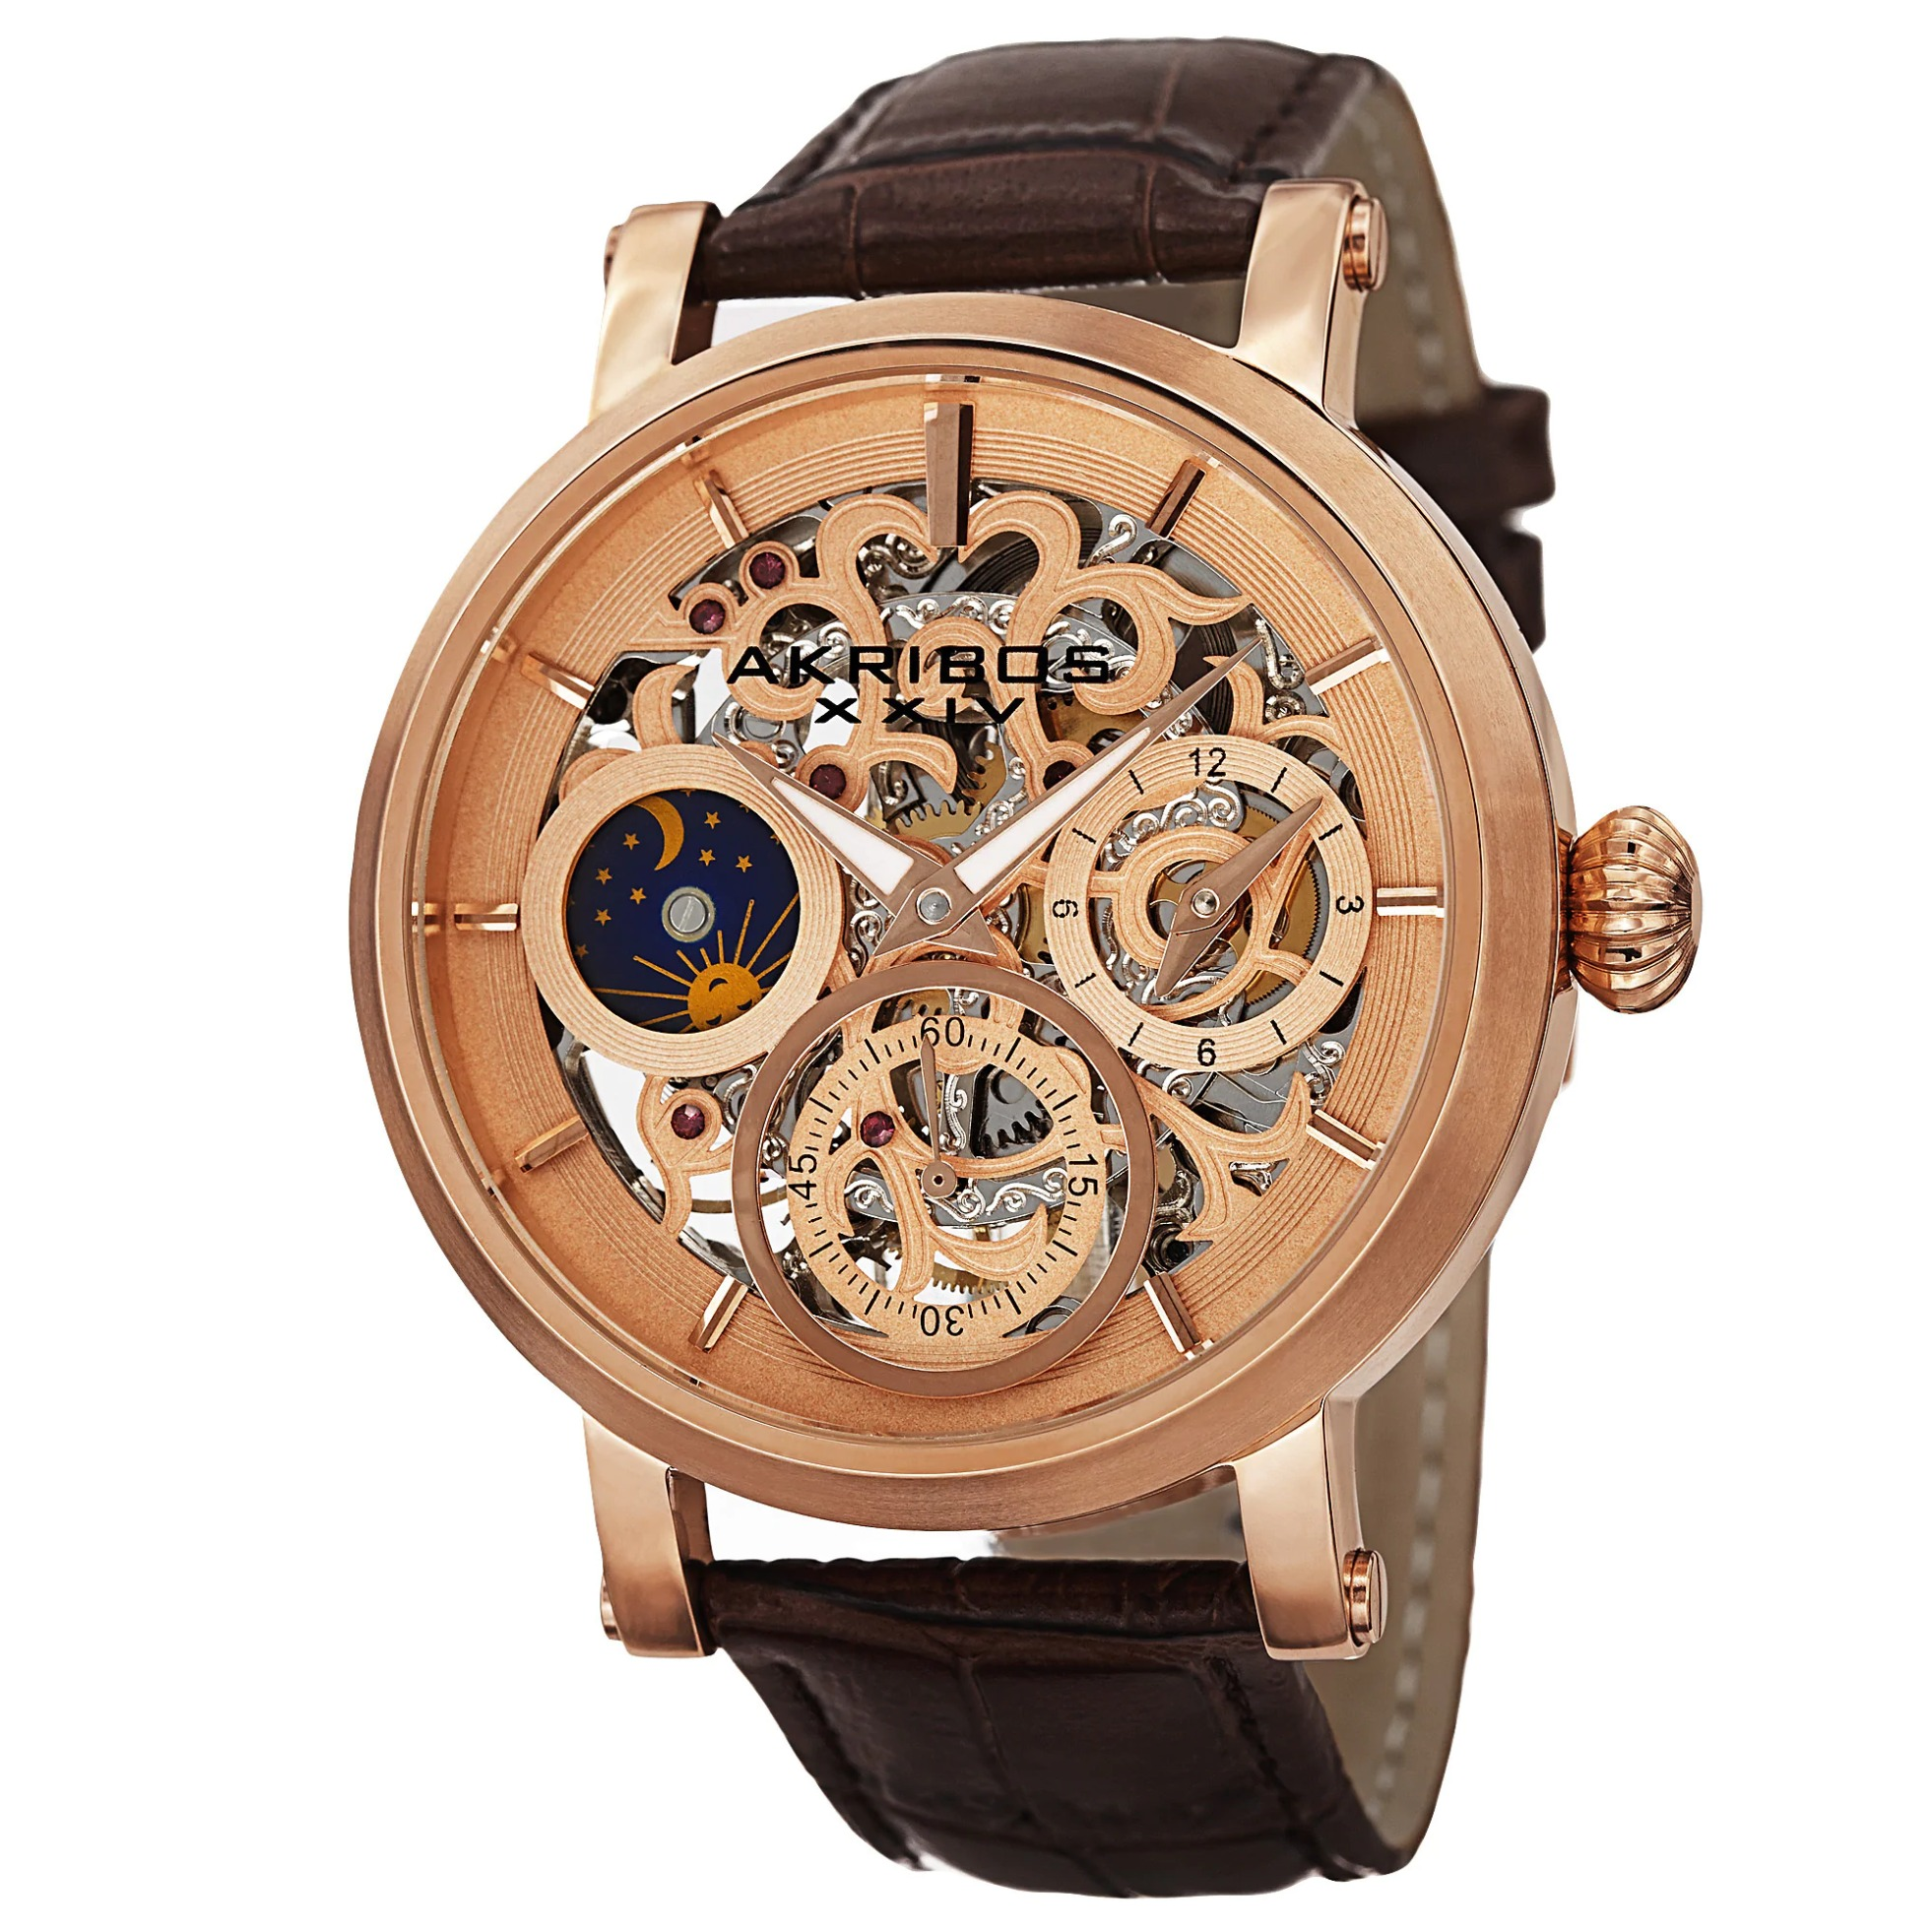 Akribos XXIV Men's Automatic Multifunction Dual-Time Skeleton Dial Leather Rose-Tone Strap Watch